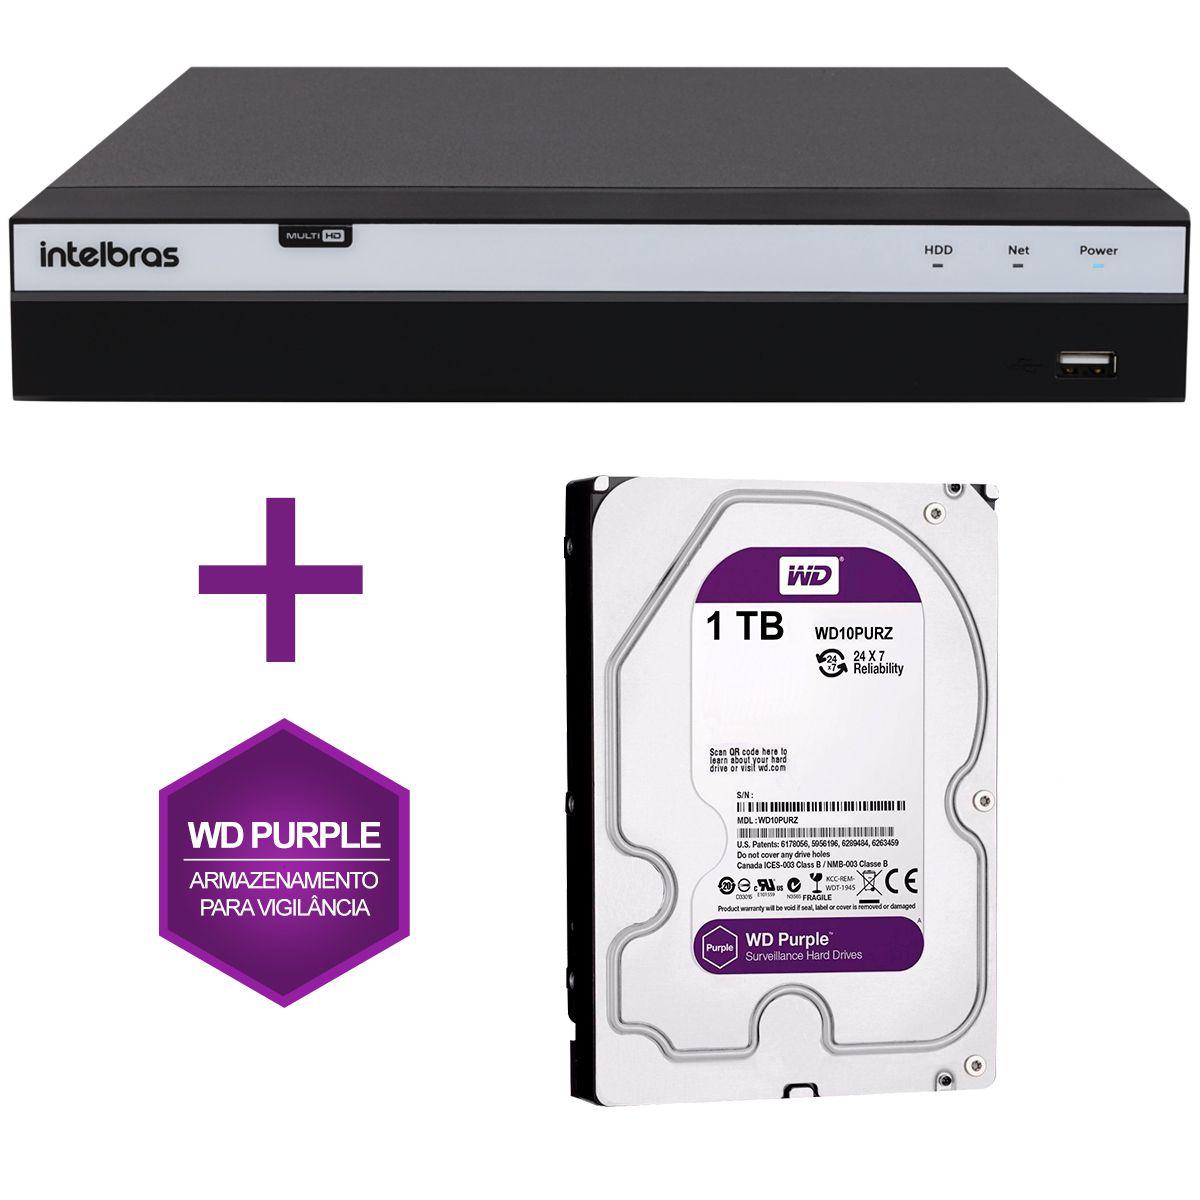 DVR Stand Alone Intelbras MHDX 3116 16 Canais Full HD 1080p Multi HD + 08 Canais IP 5 Mp + HD WD Purple 1TB  - Tudo Forte